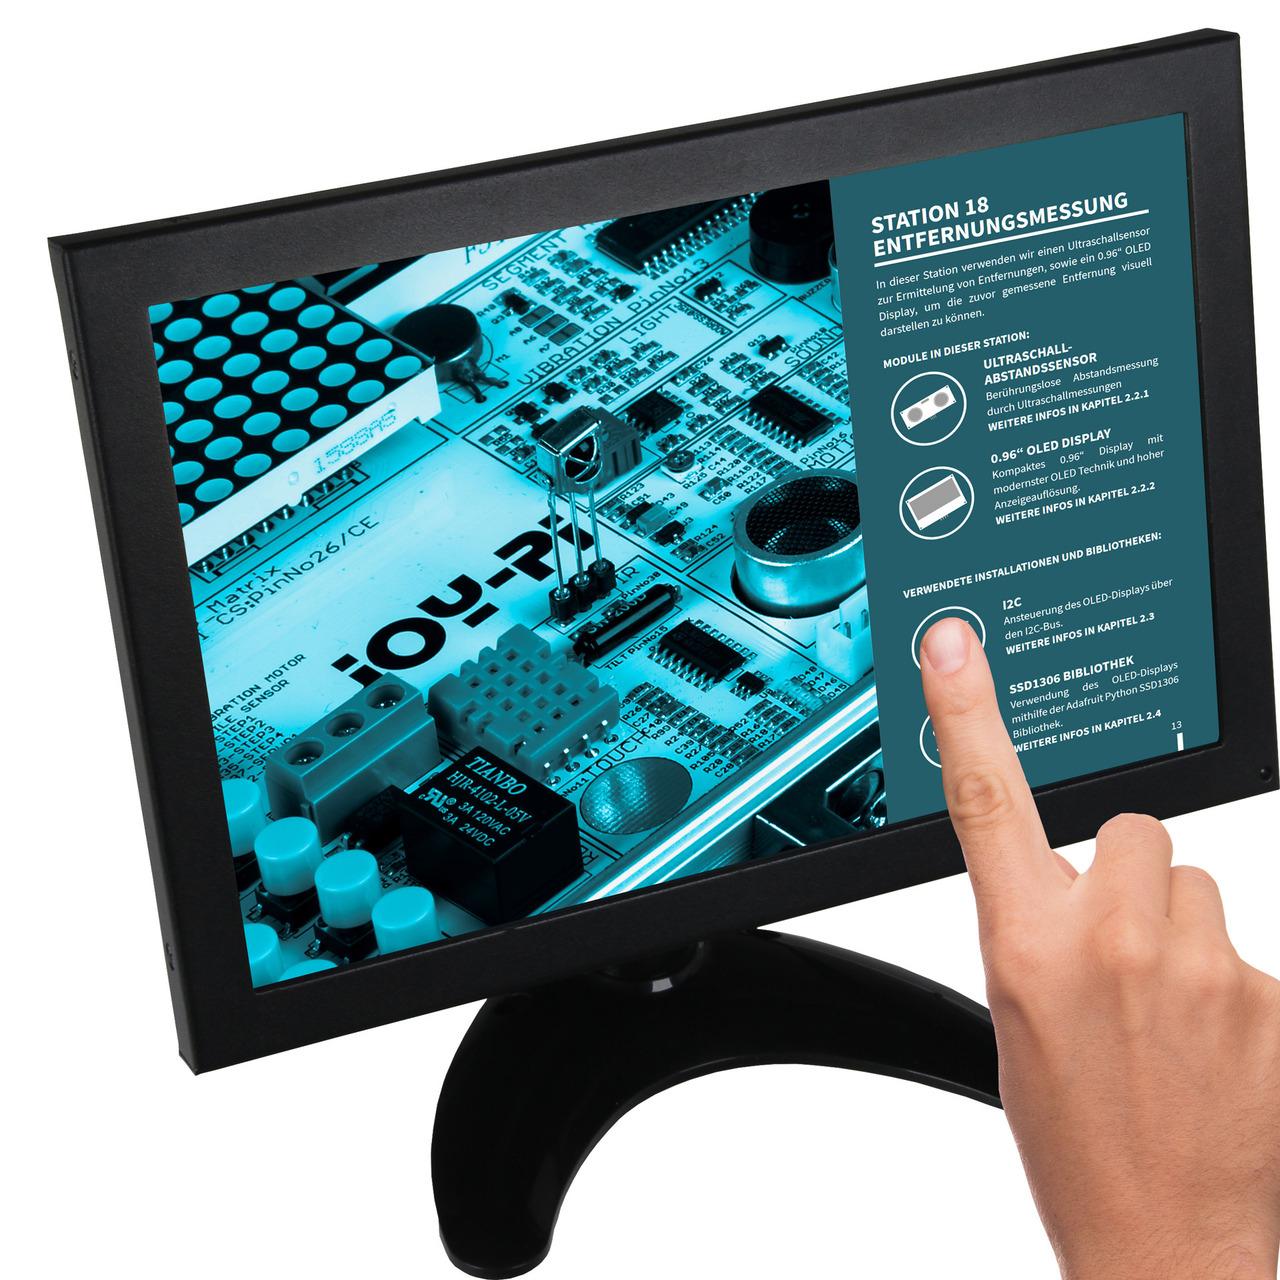 JOY-IT Touchscreen-Monitor RB-LCD-10-2- 10-1undquot -IPS-Display- Metallgehund-228 use- geeignet fund-252 r Raspberry Pi